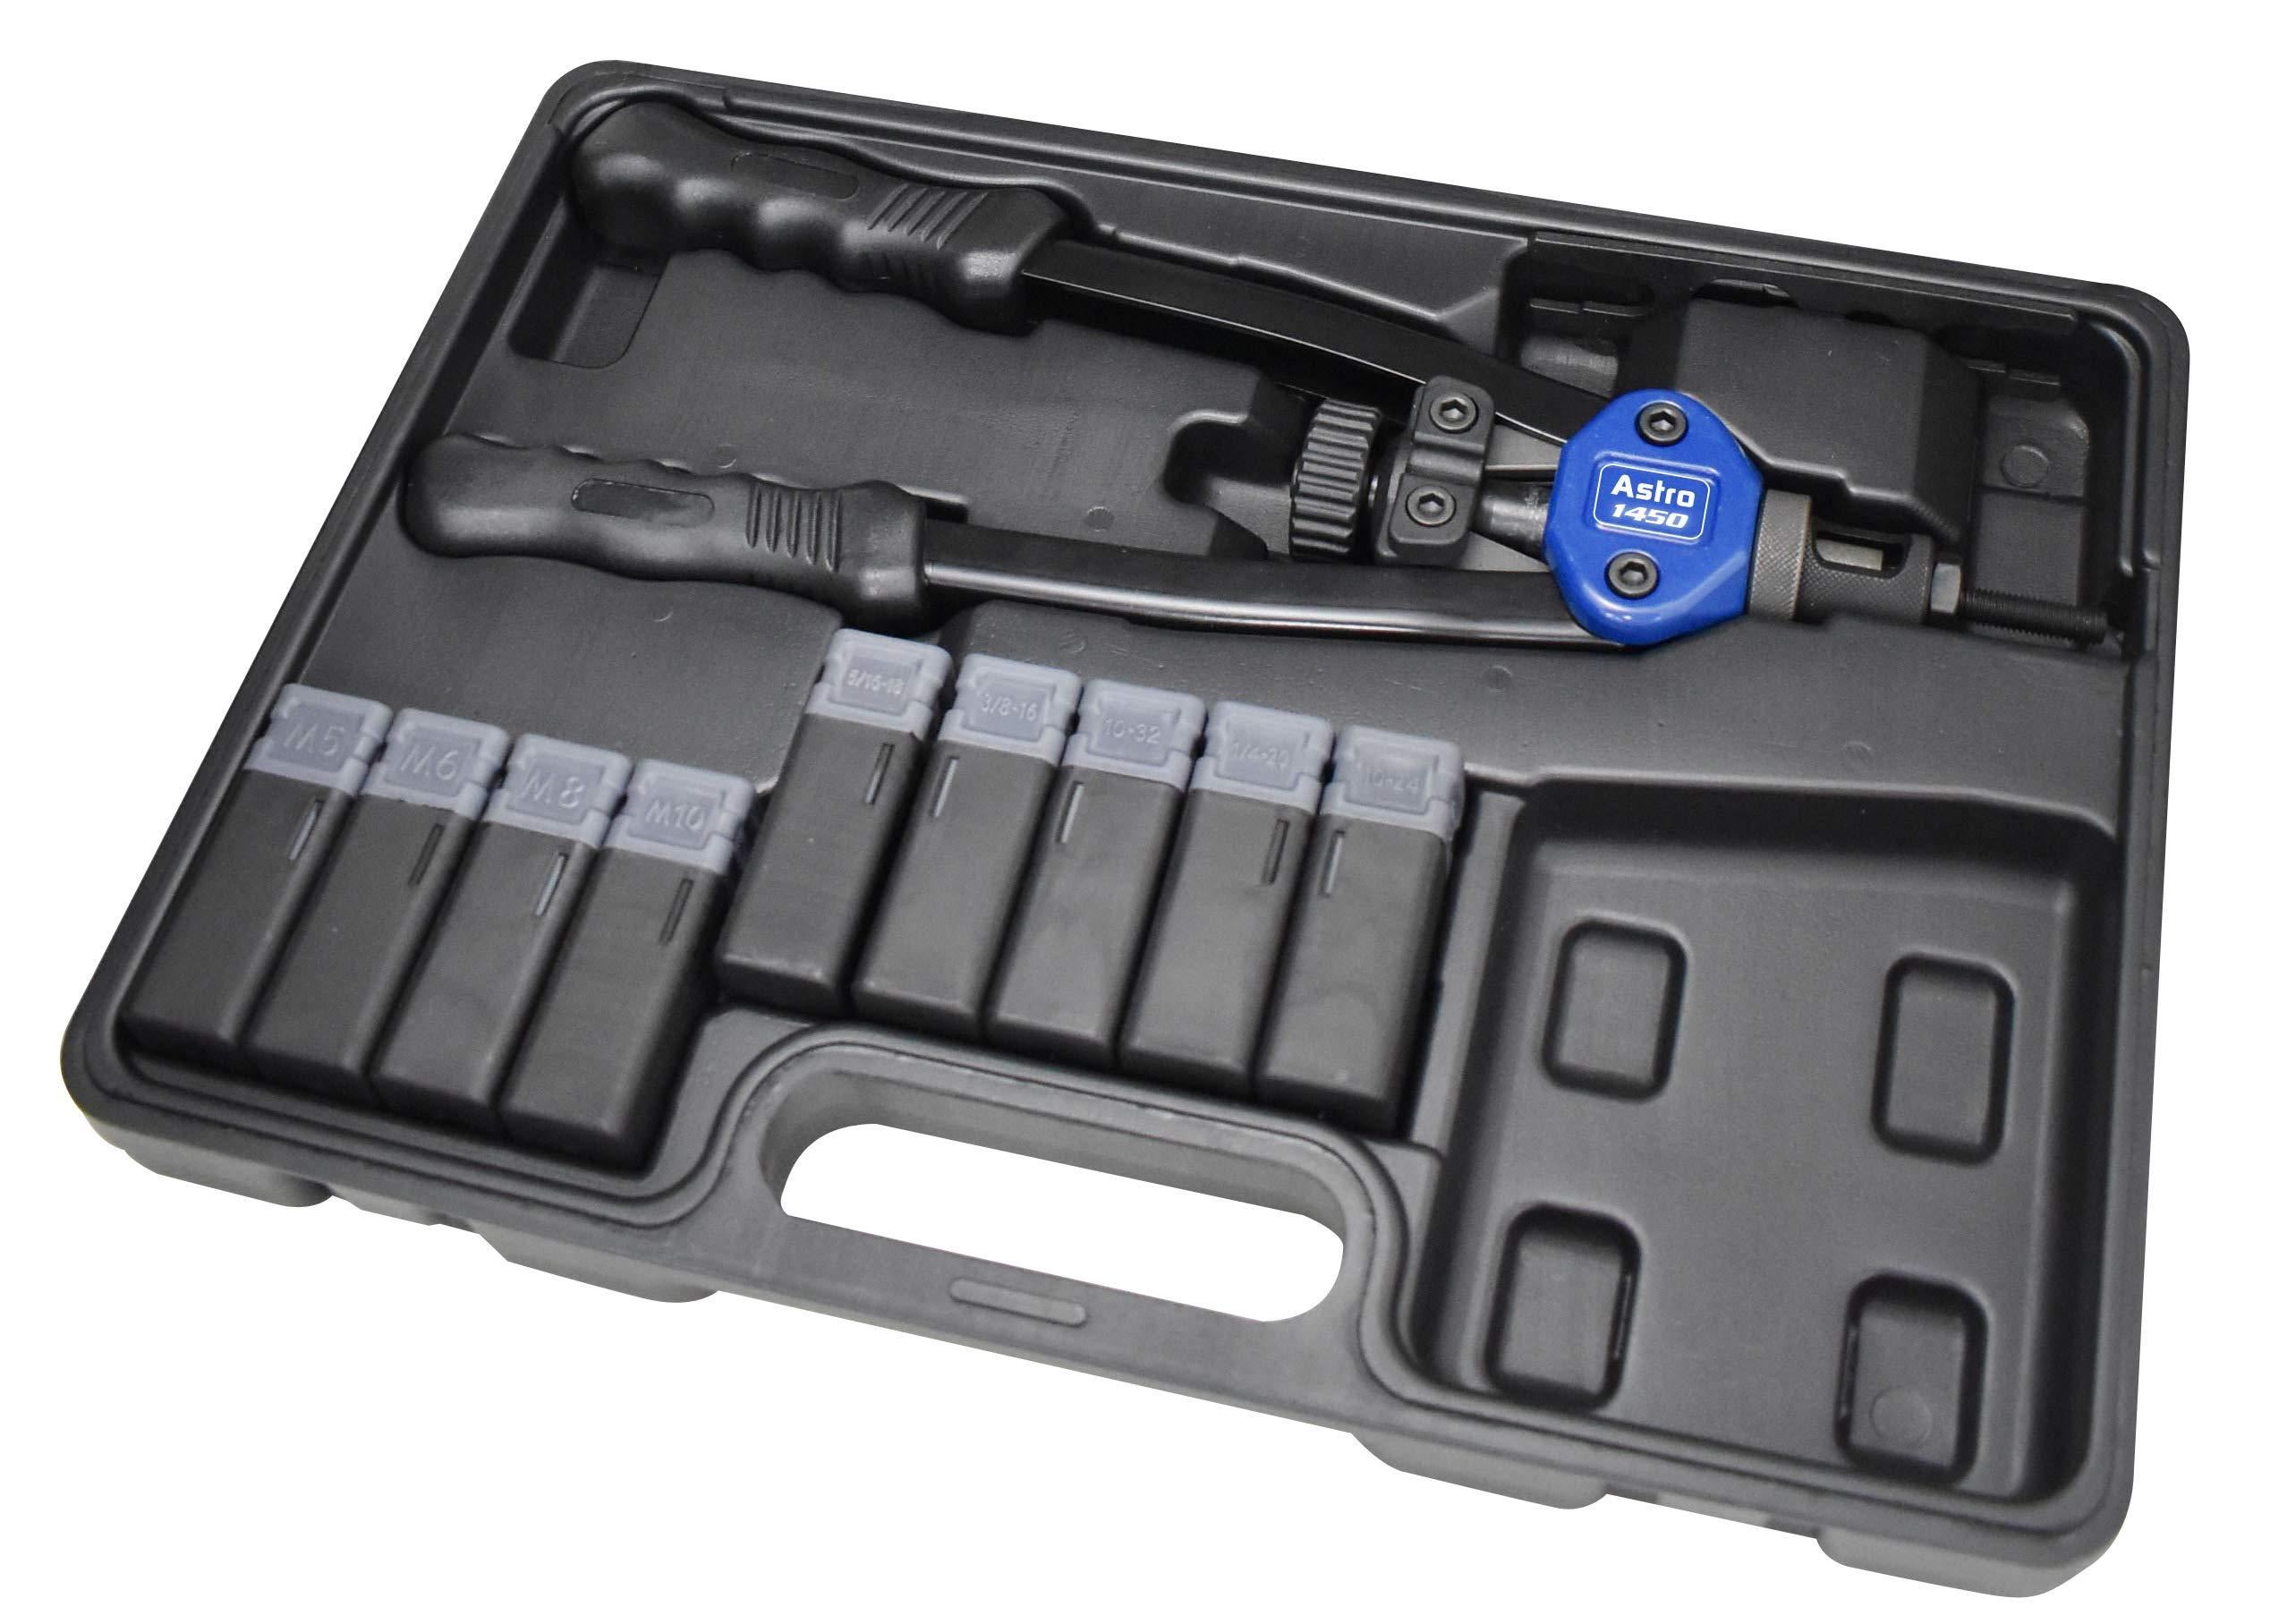 Astro Pneumatic Tool 1450 13'' Plusnut & Extra-Long Rivet Nut Setter Kit by Astro Pneumatic Tool (Image #2)